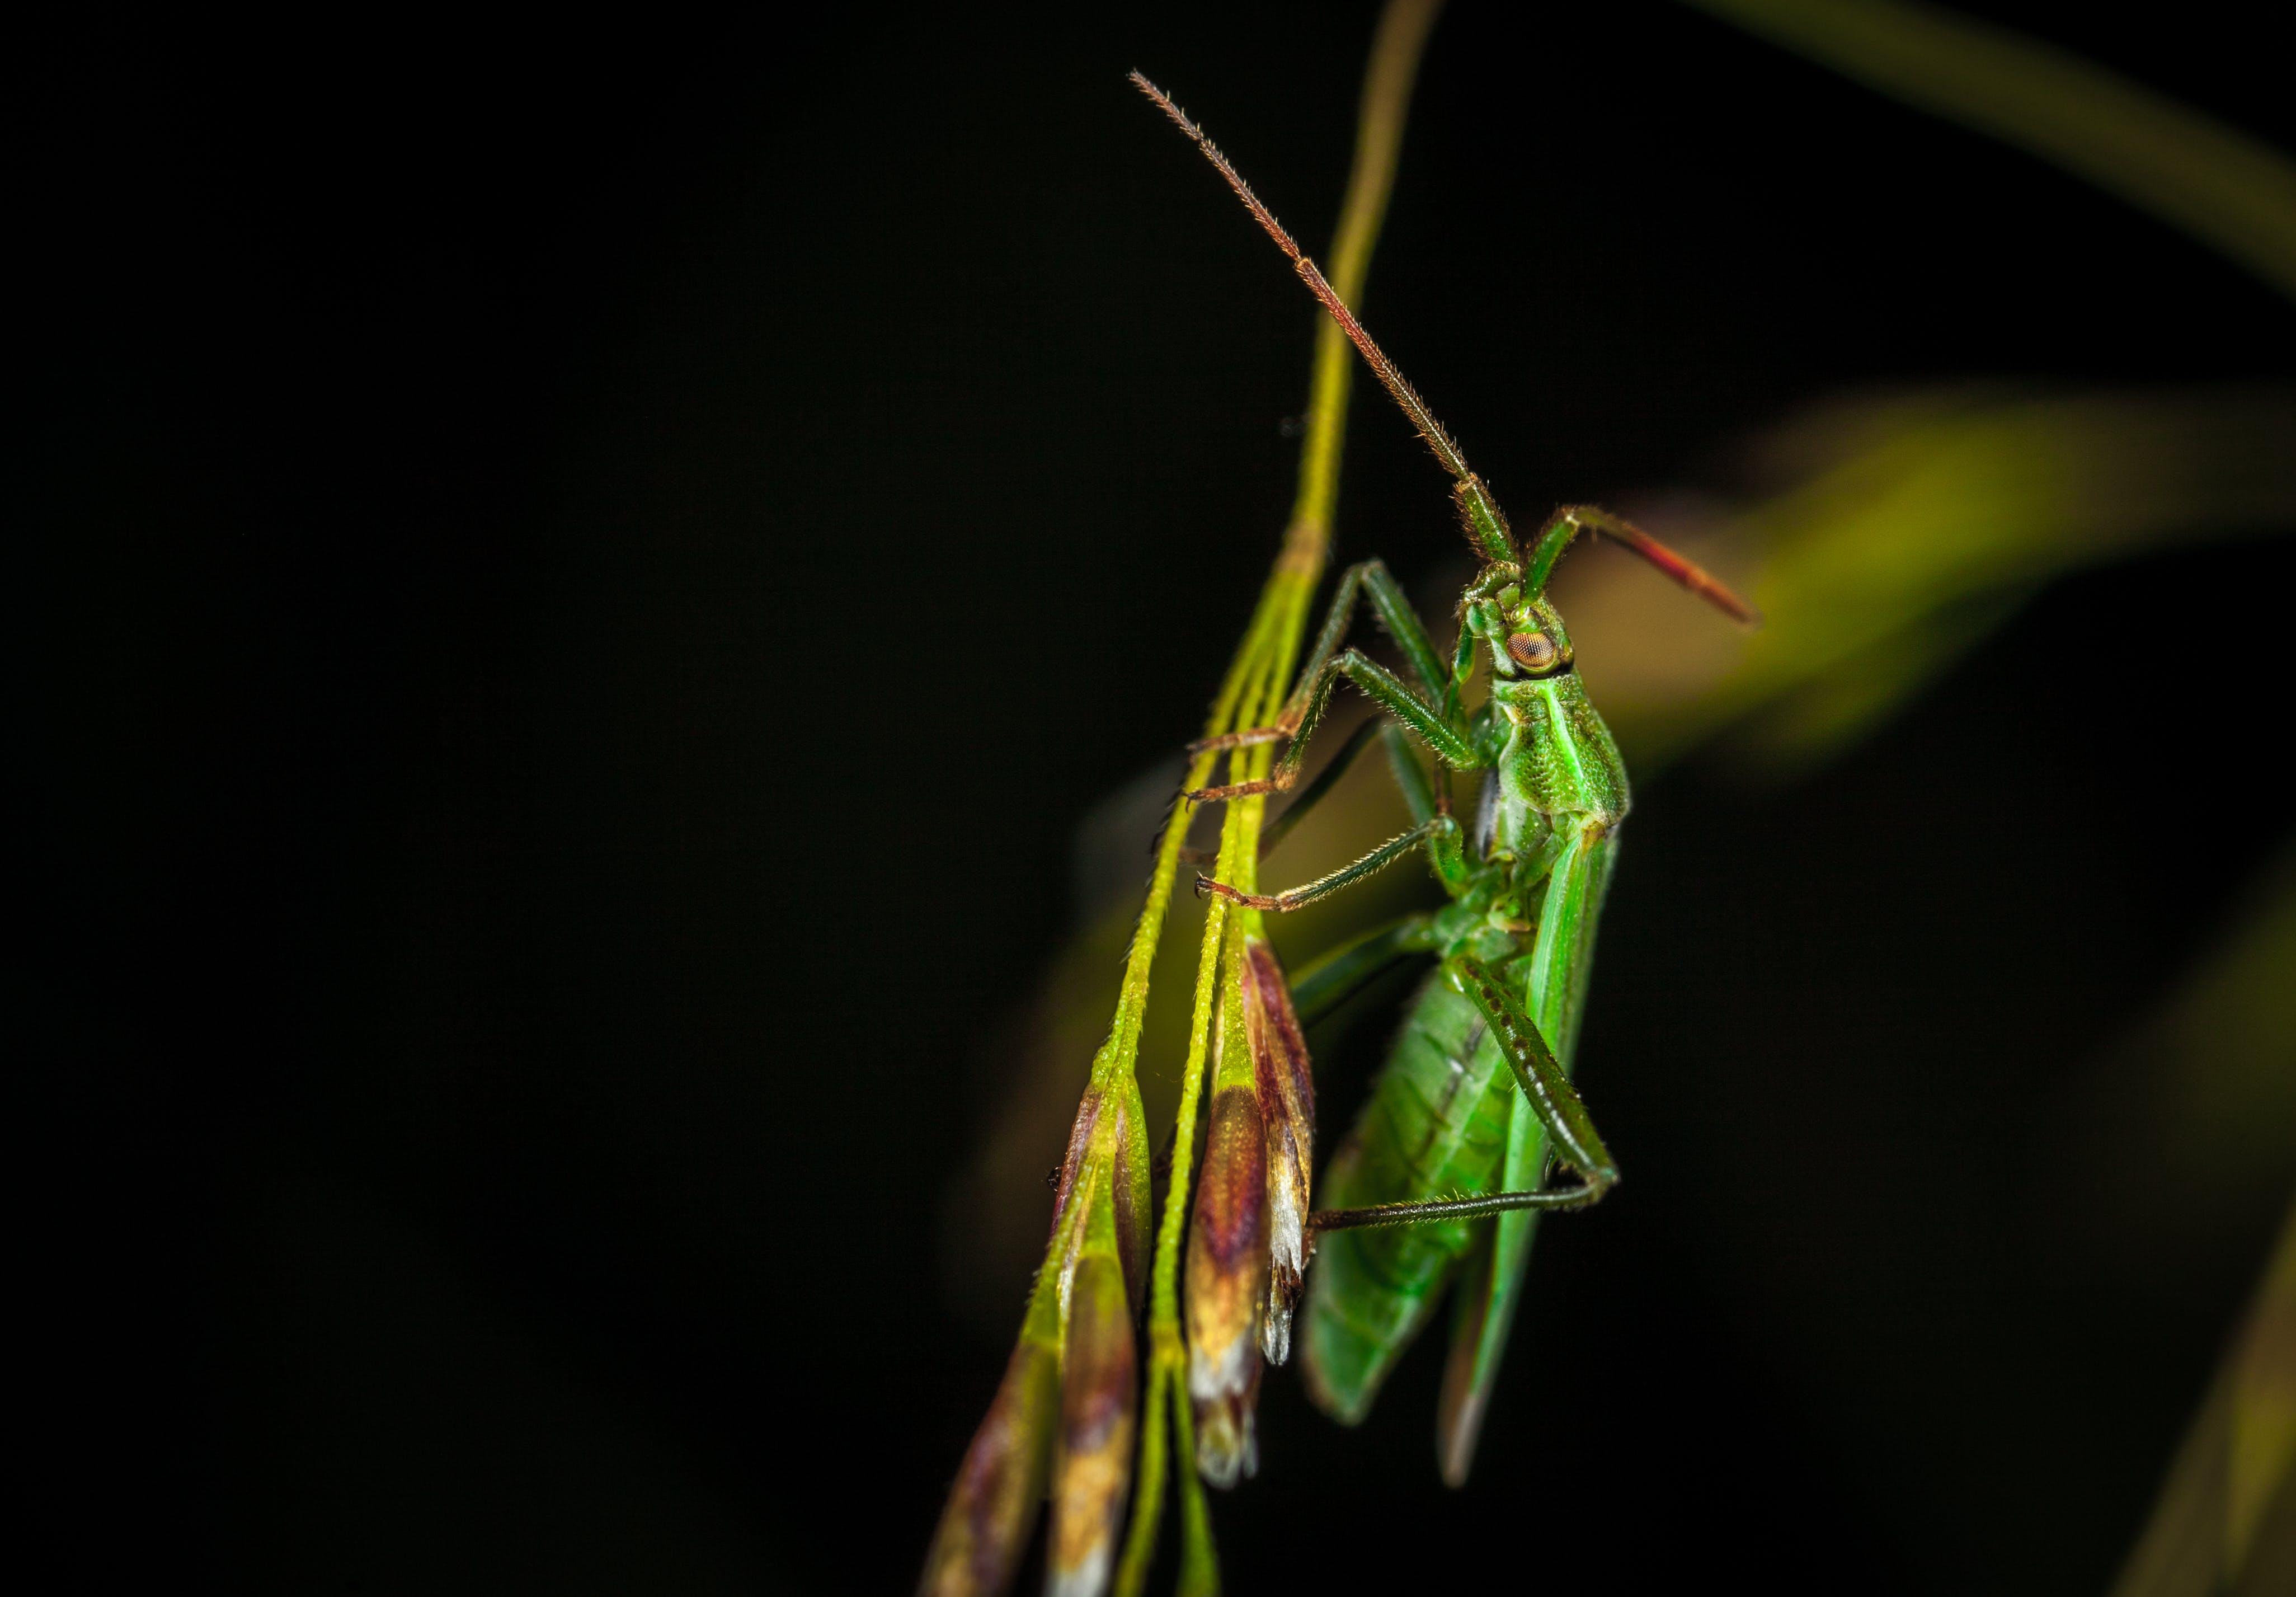 biologie, entomologie, flügel